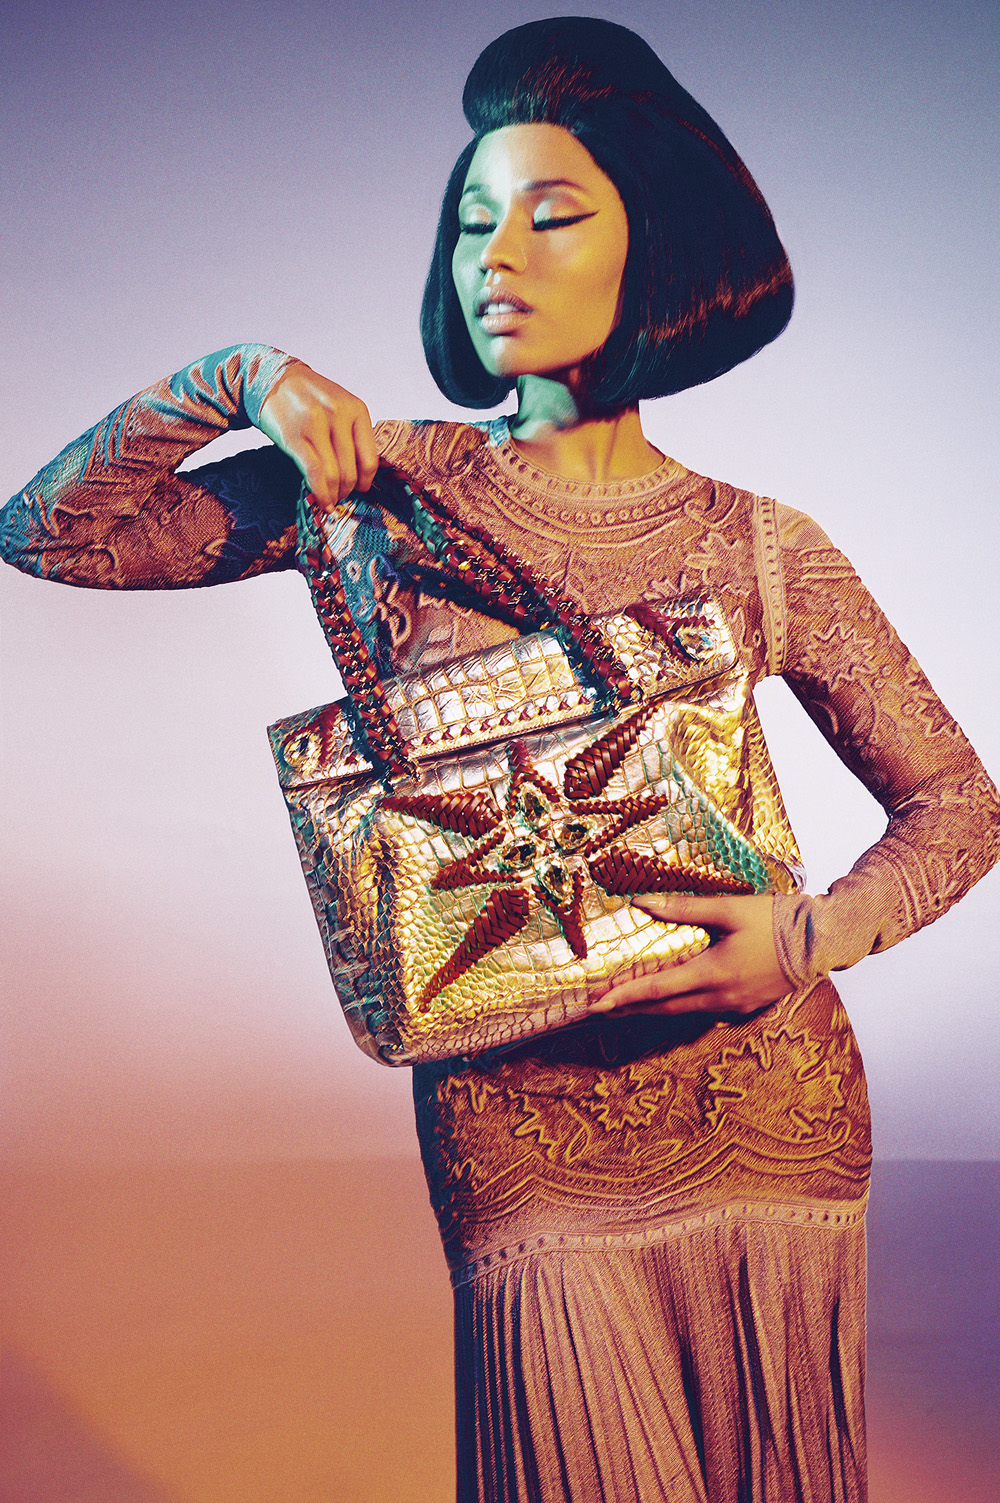 Nicki Minaj for Roberto Cavalli Spring Summer 2015 Campaign-6